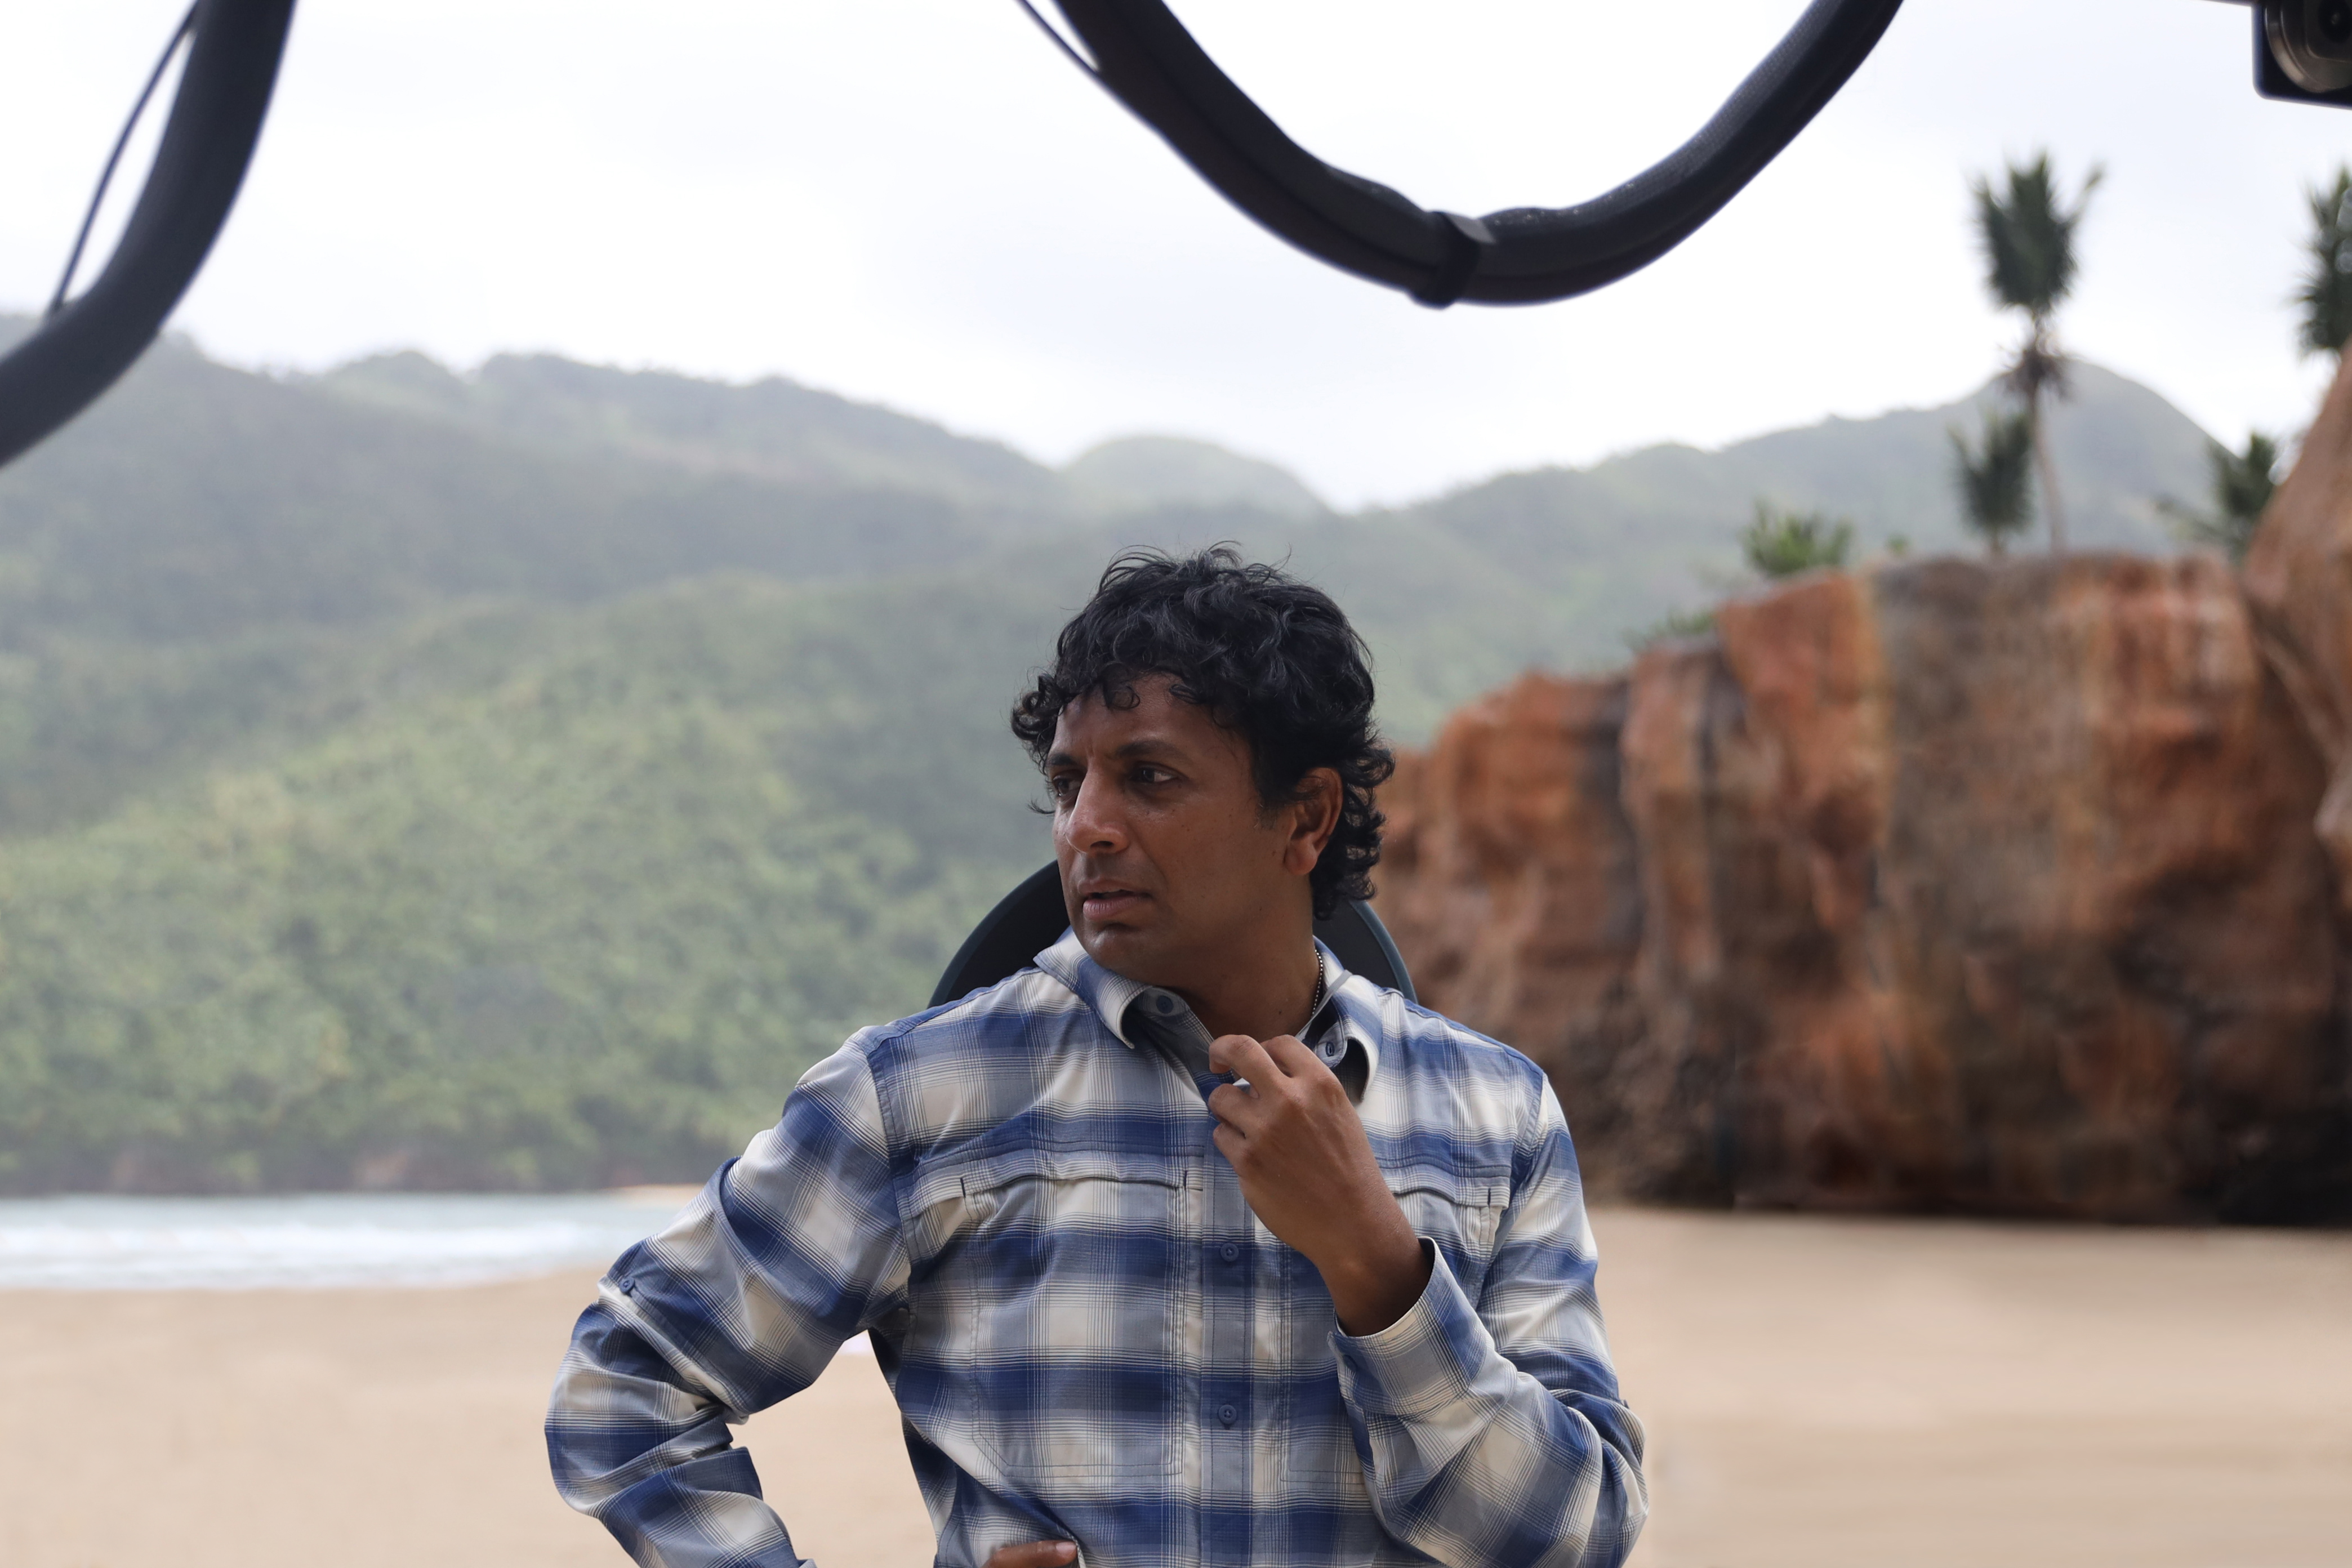 Writer/Director M. Night Shyamalan, Old (2021 movie)